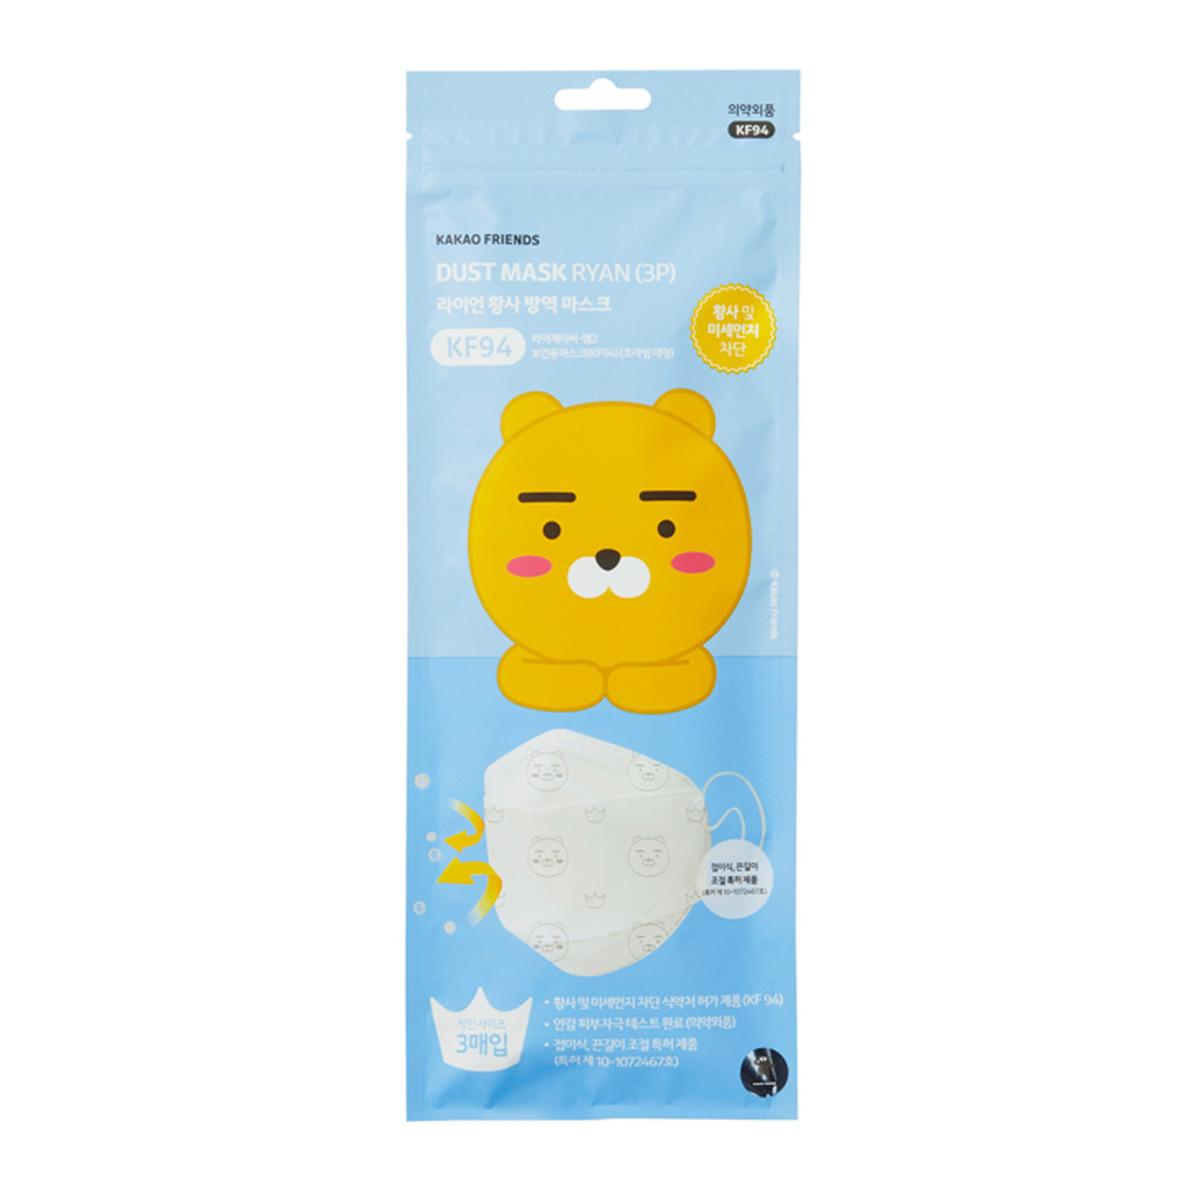 For kids Dust Mask 3P_Ryan